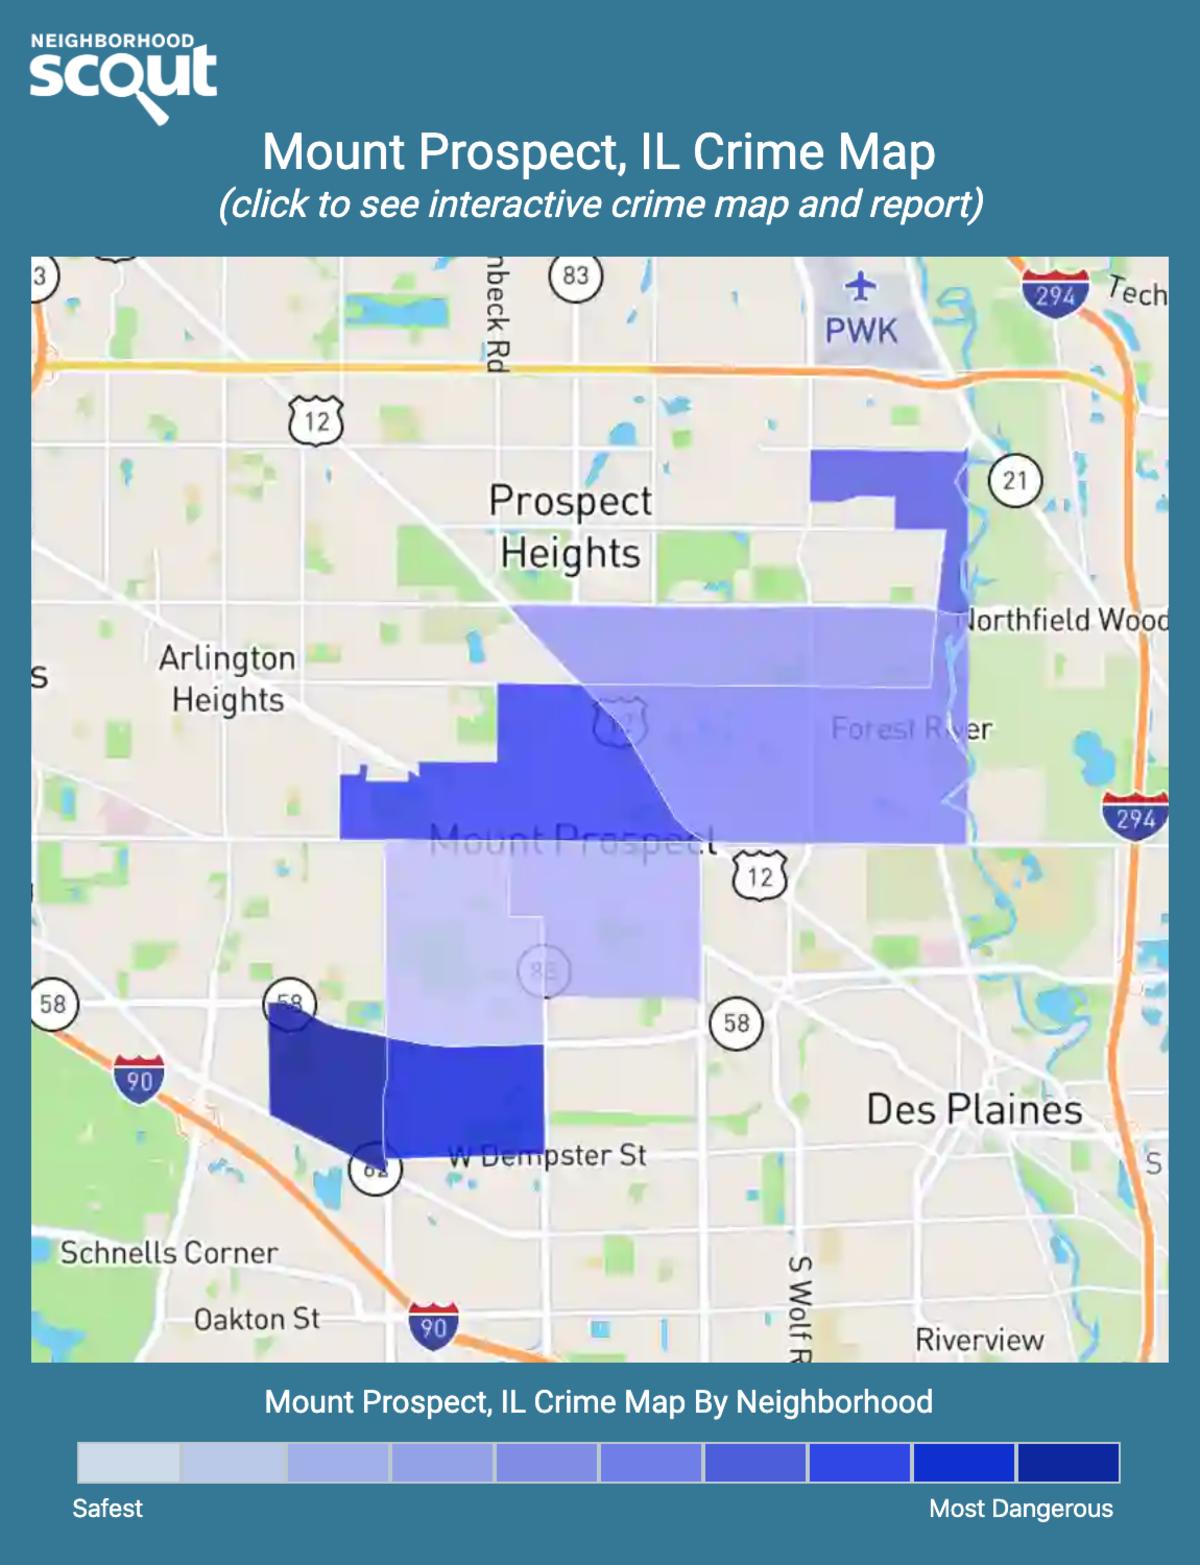 Mount Prospect, Illinois crime map